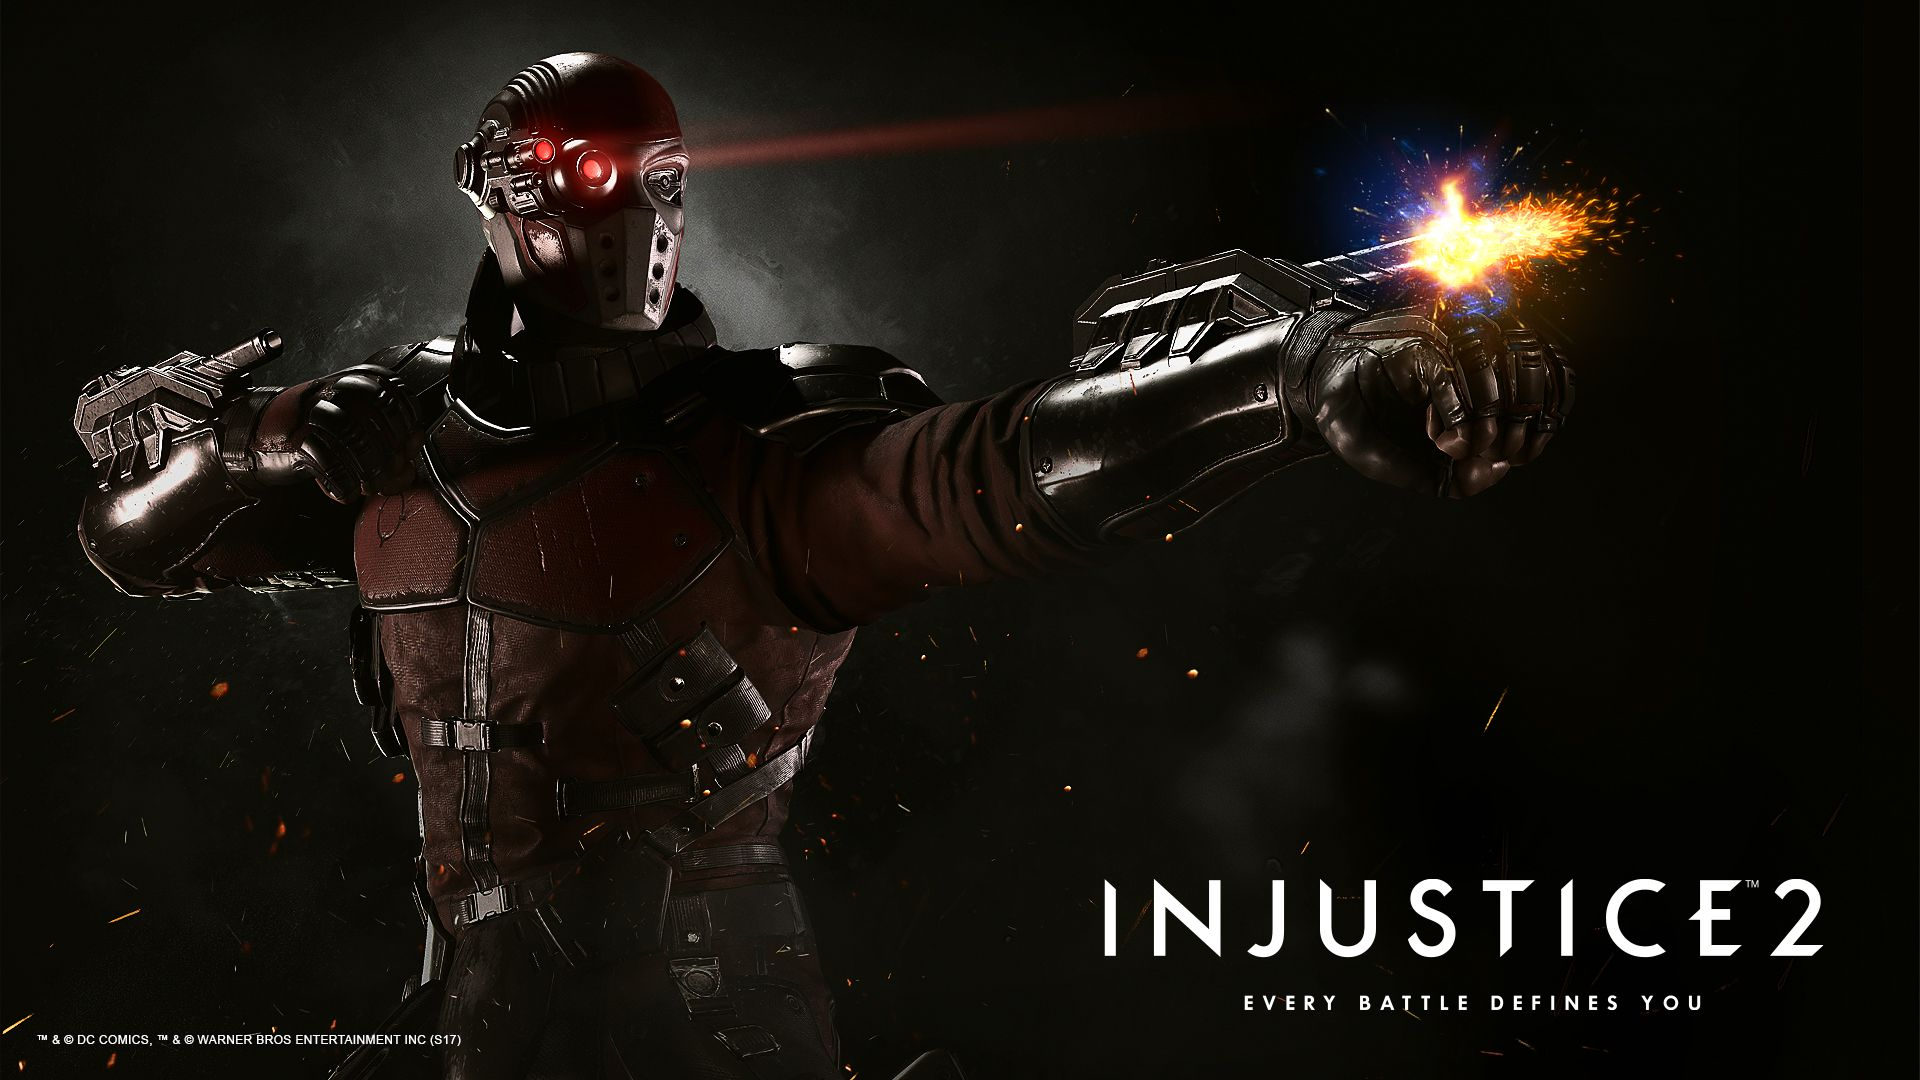 Wallpaper From Injustice Dead Shot Injustice 2 204254